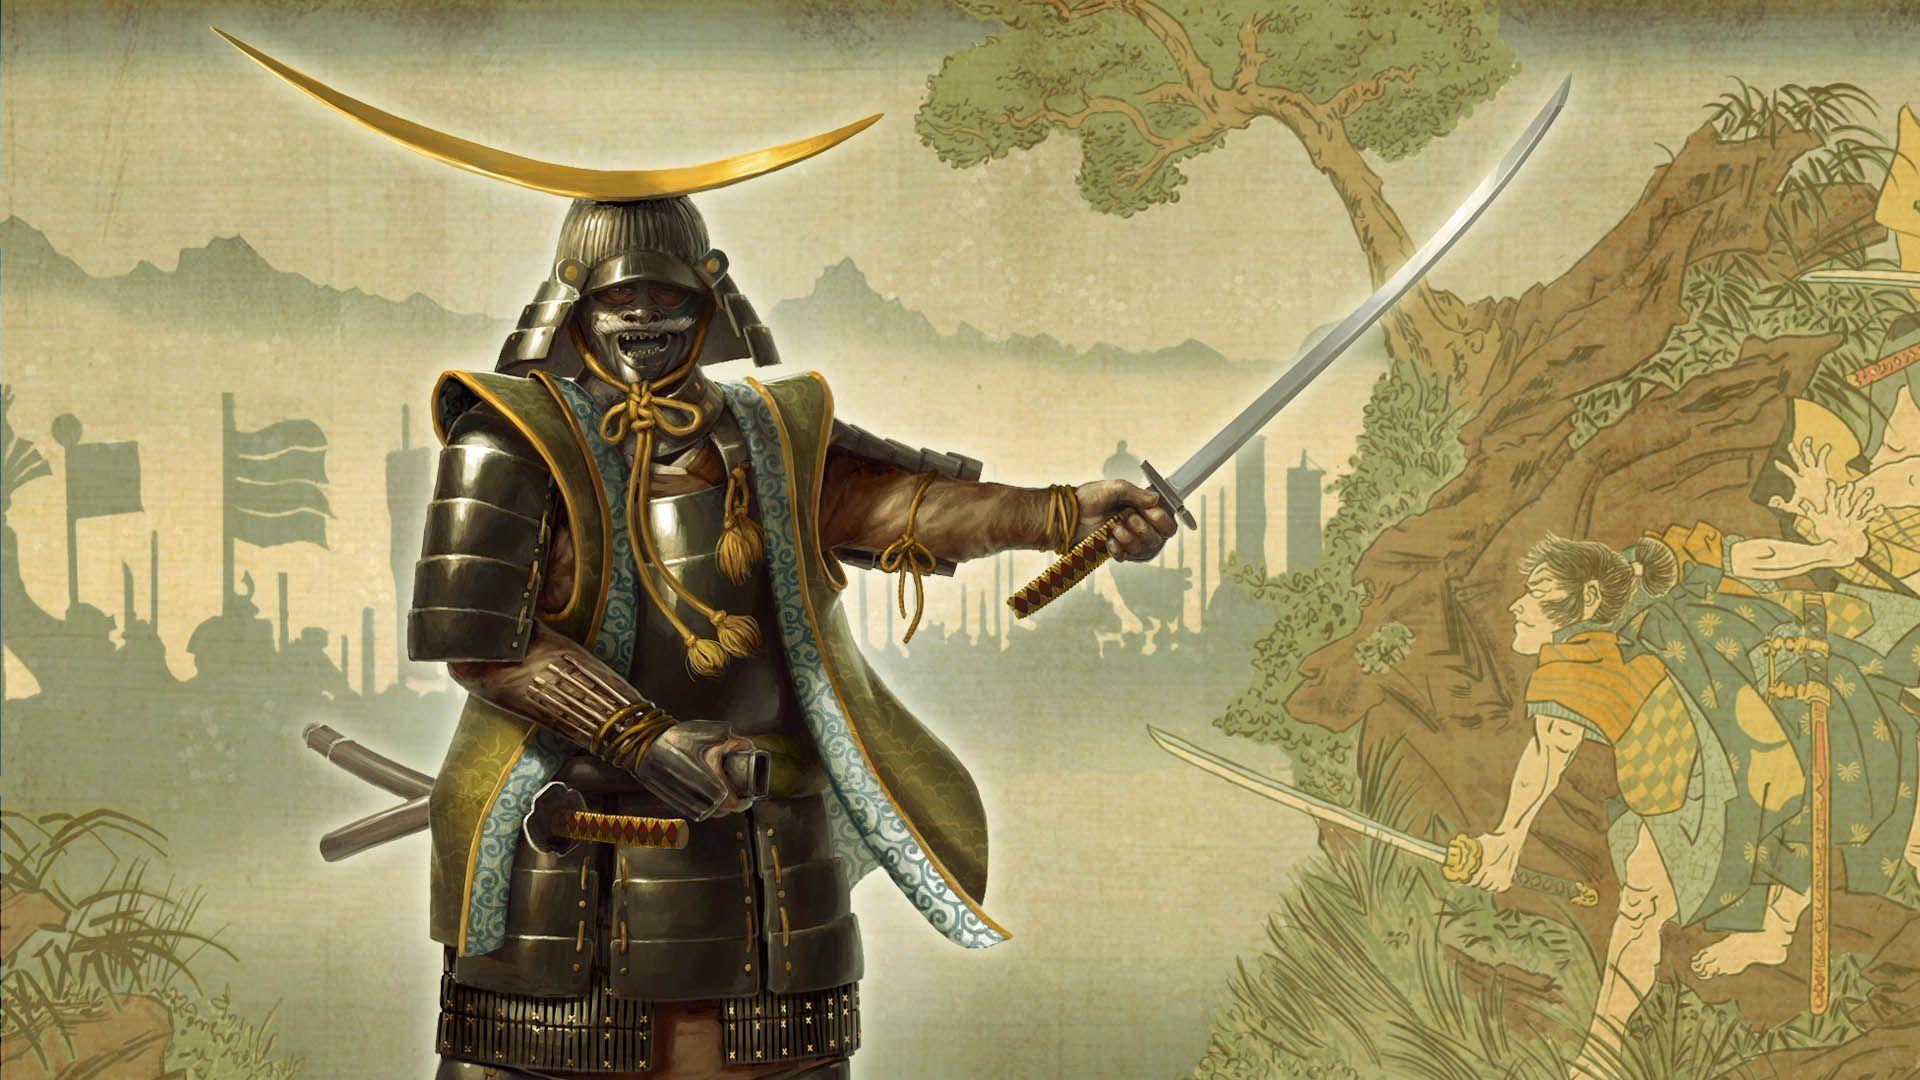 shogun wallpapers - wallpaper cave